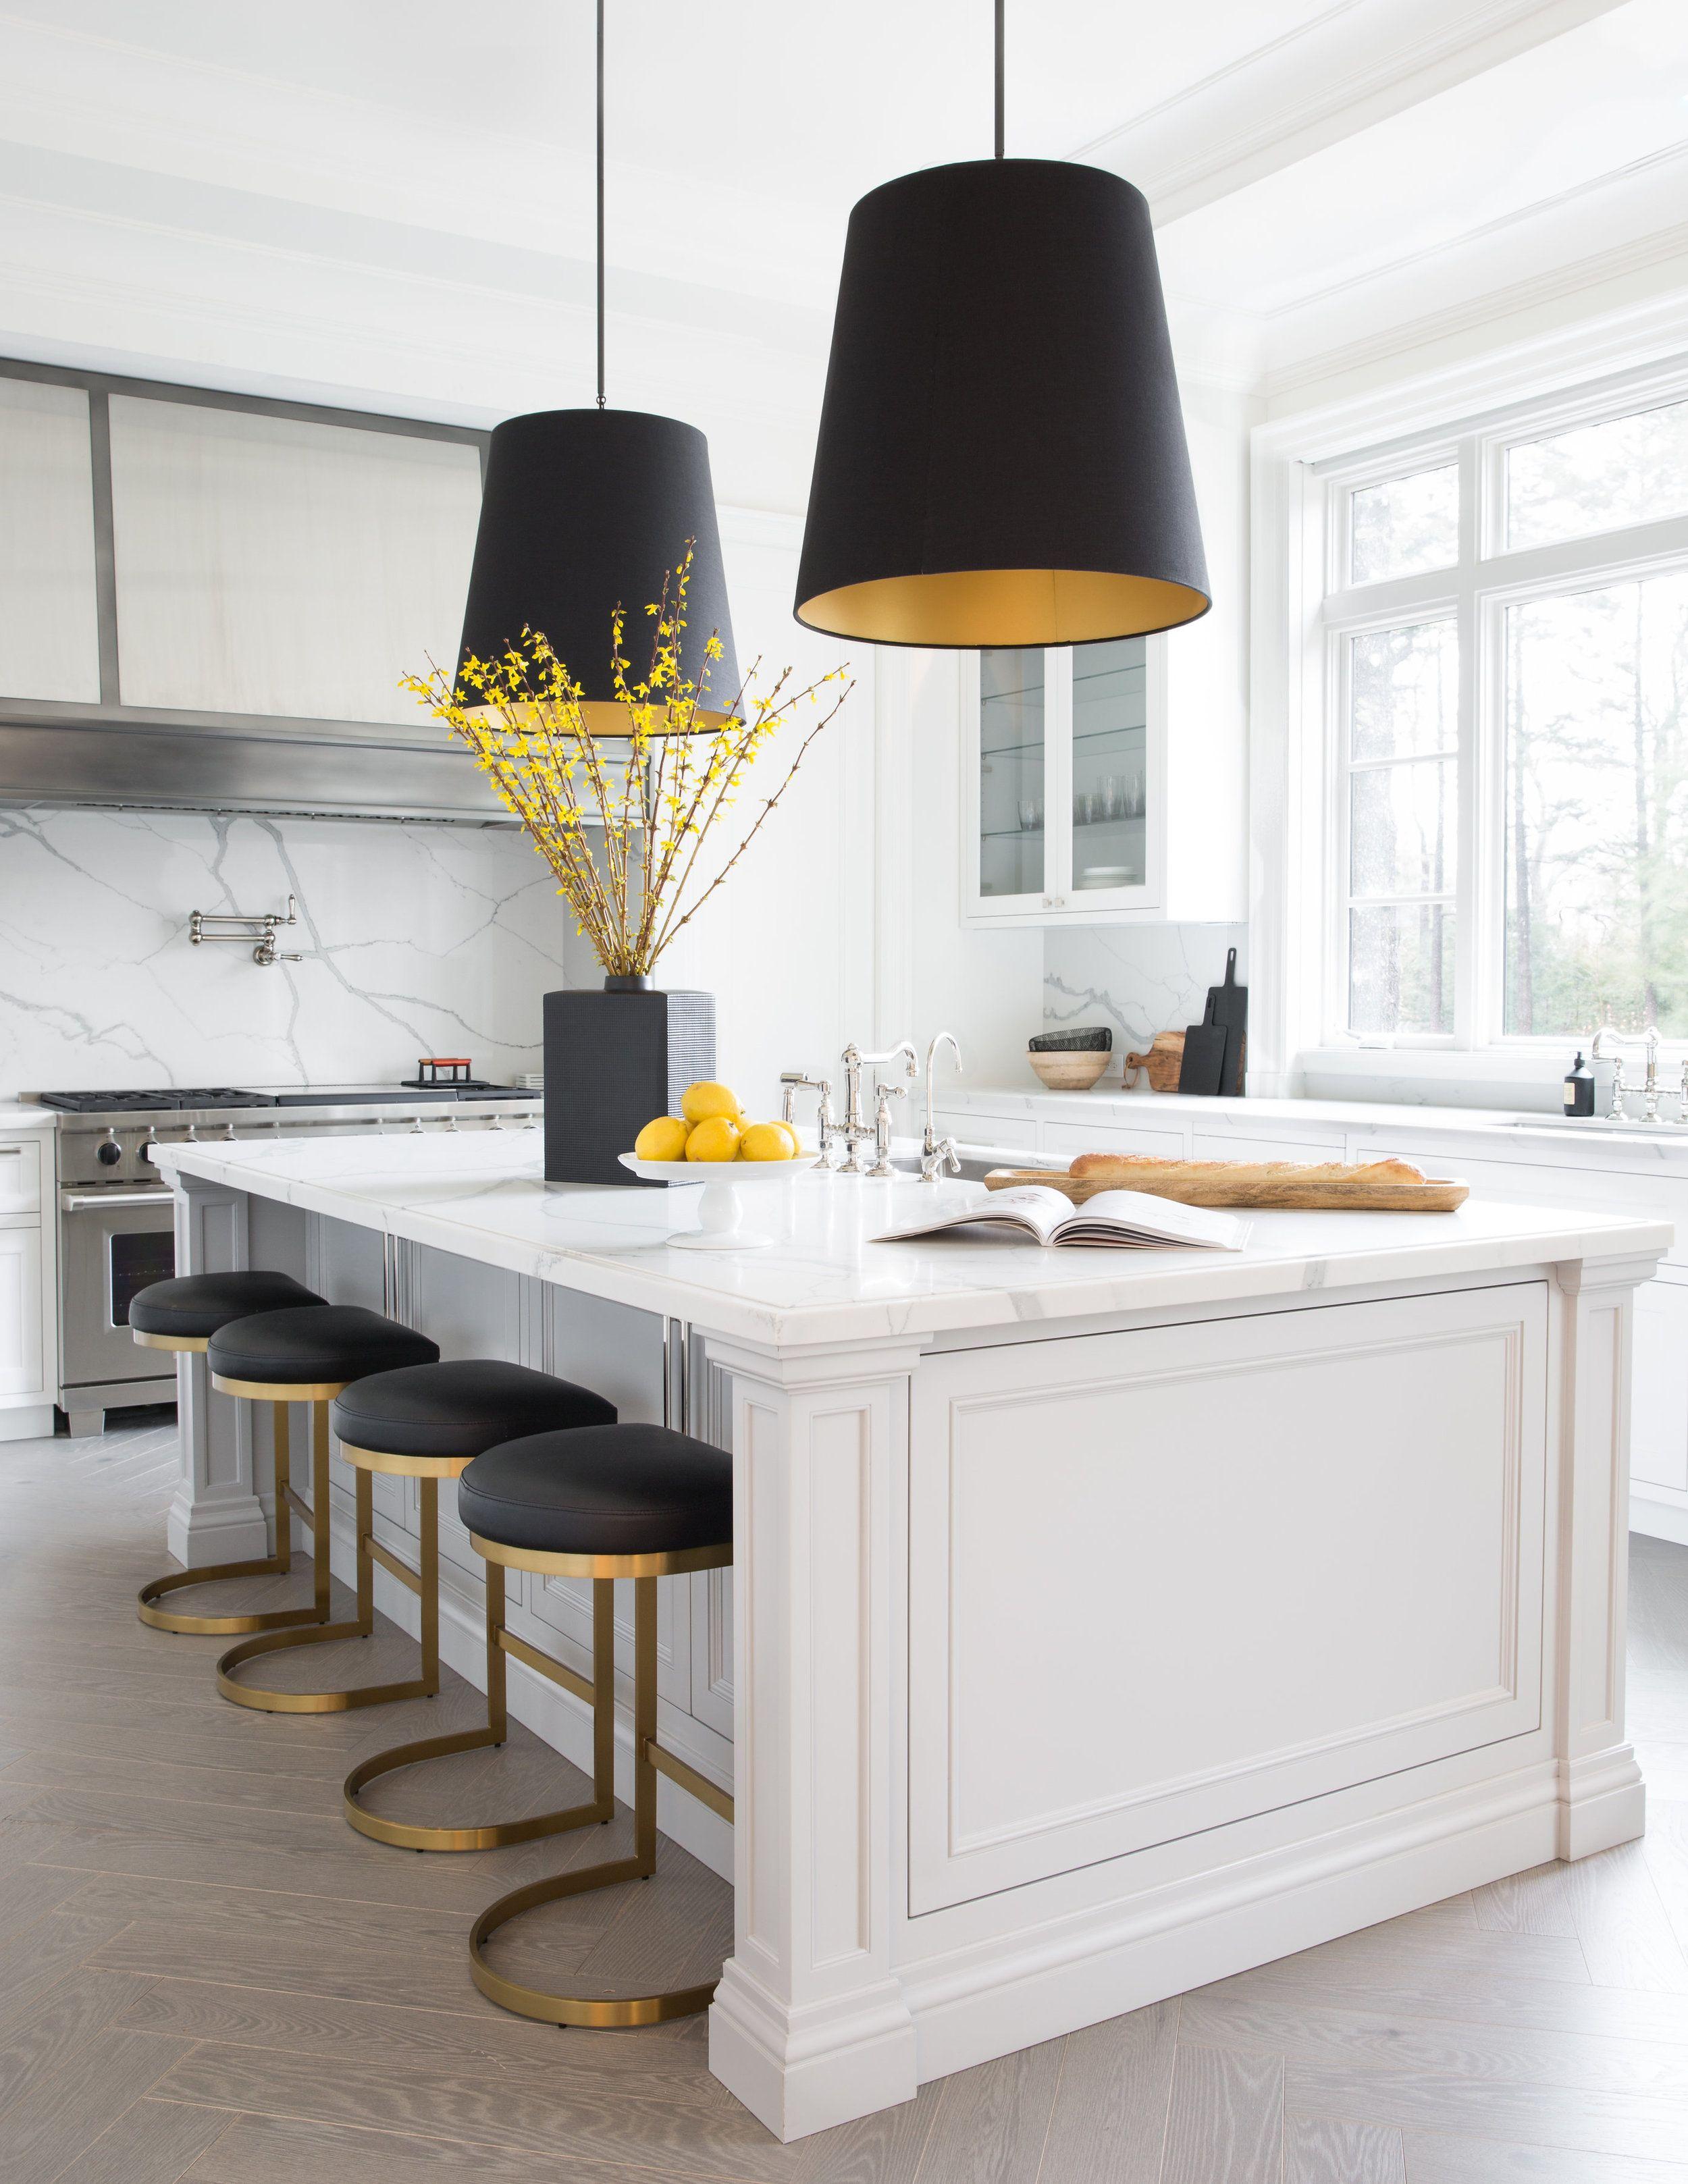 simple black and white kitchen photo by lauren miller design by rh pinterest com